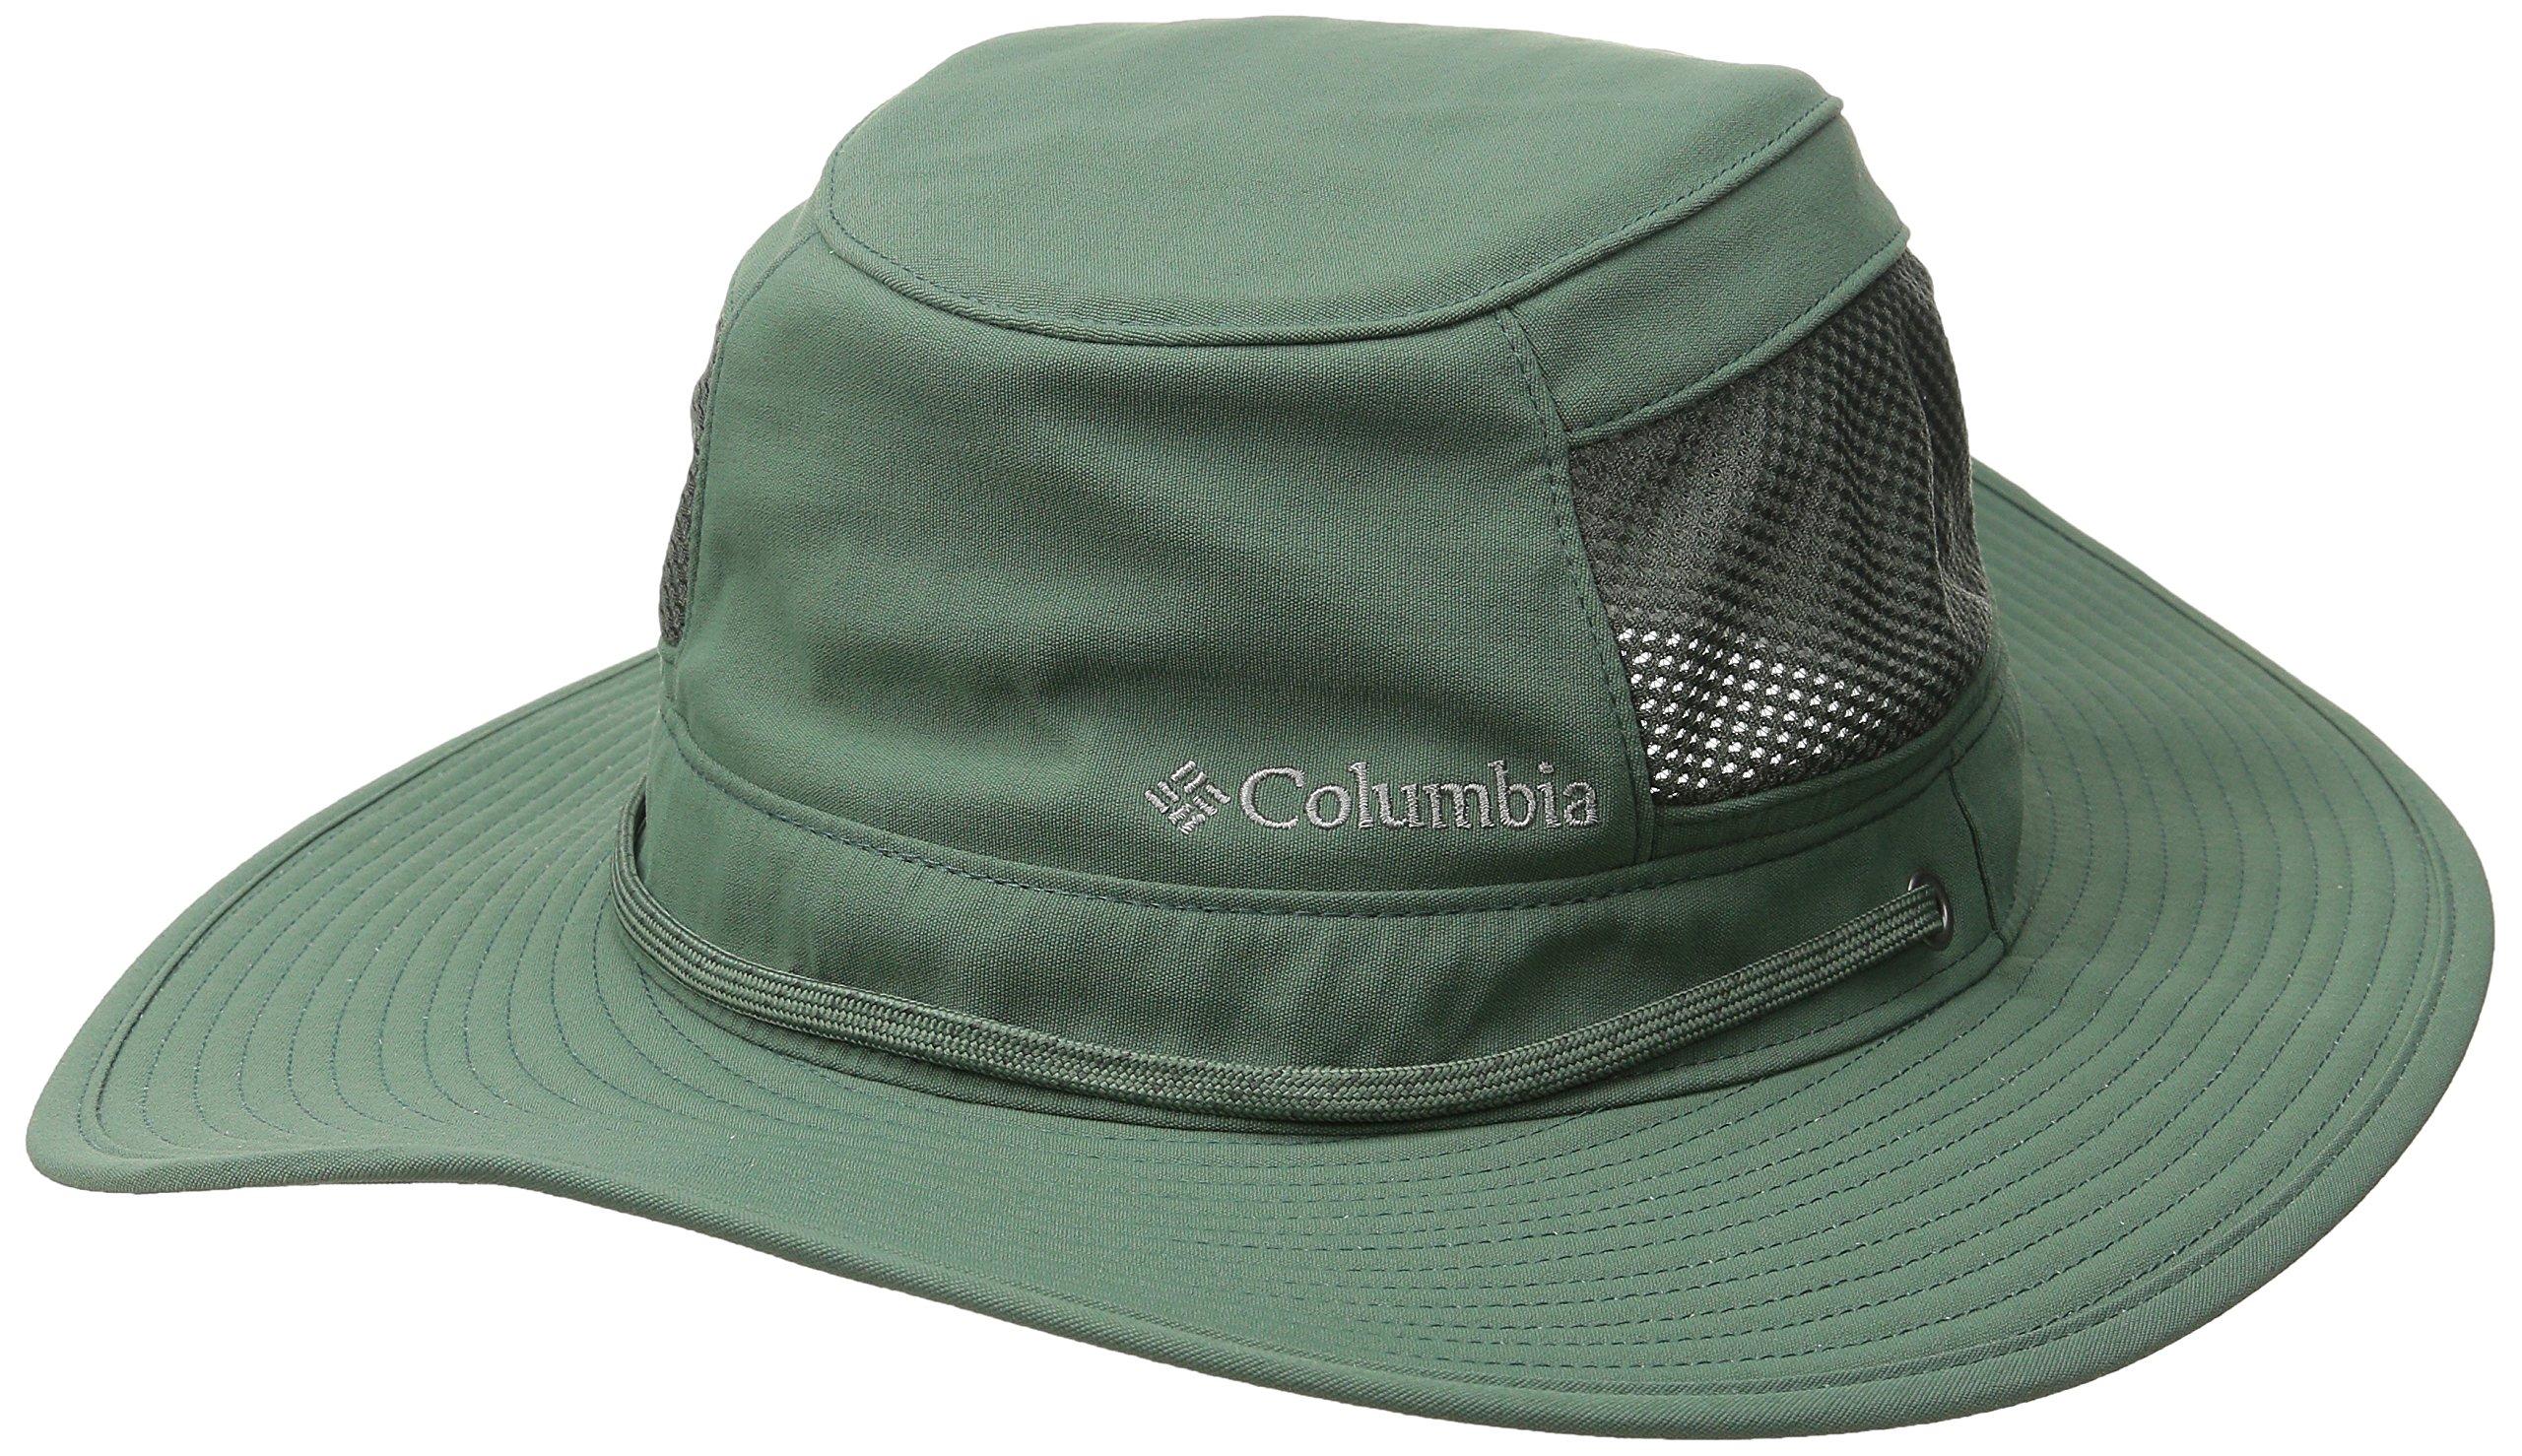 Columbia Men's Carl Peak Booney, Commando, One Size